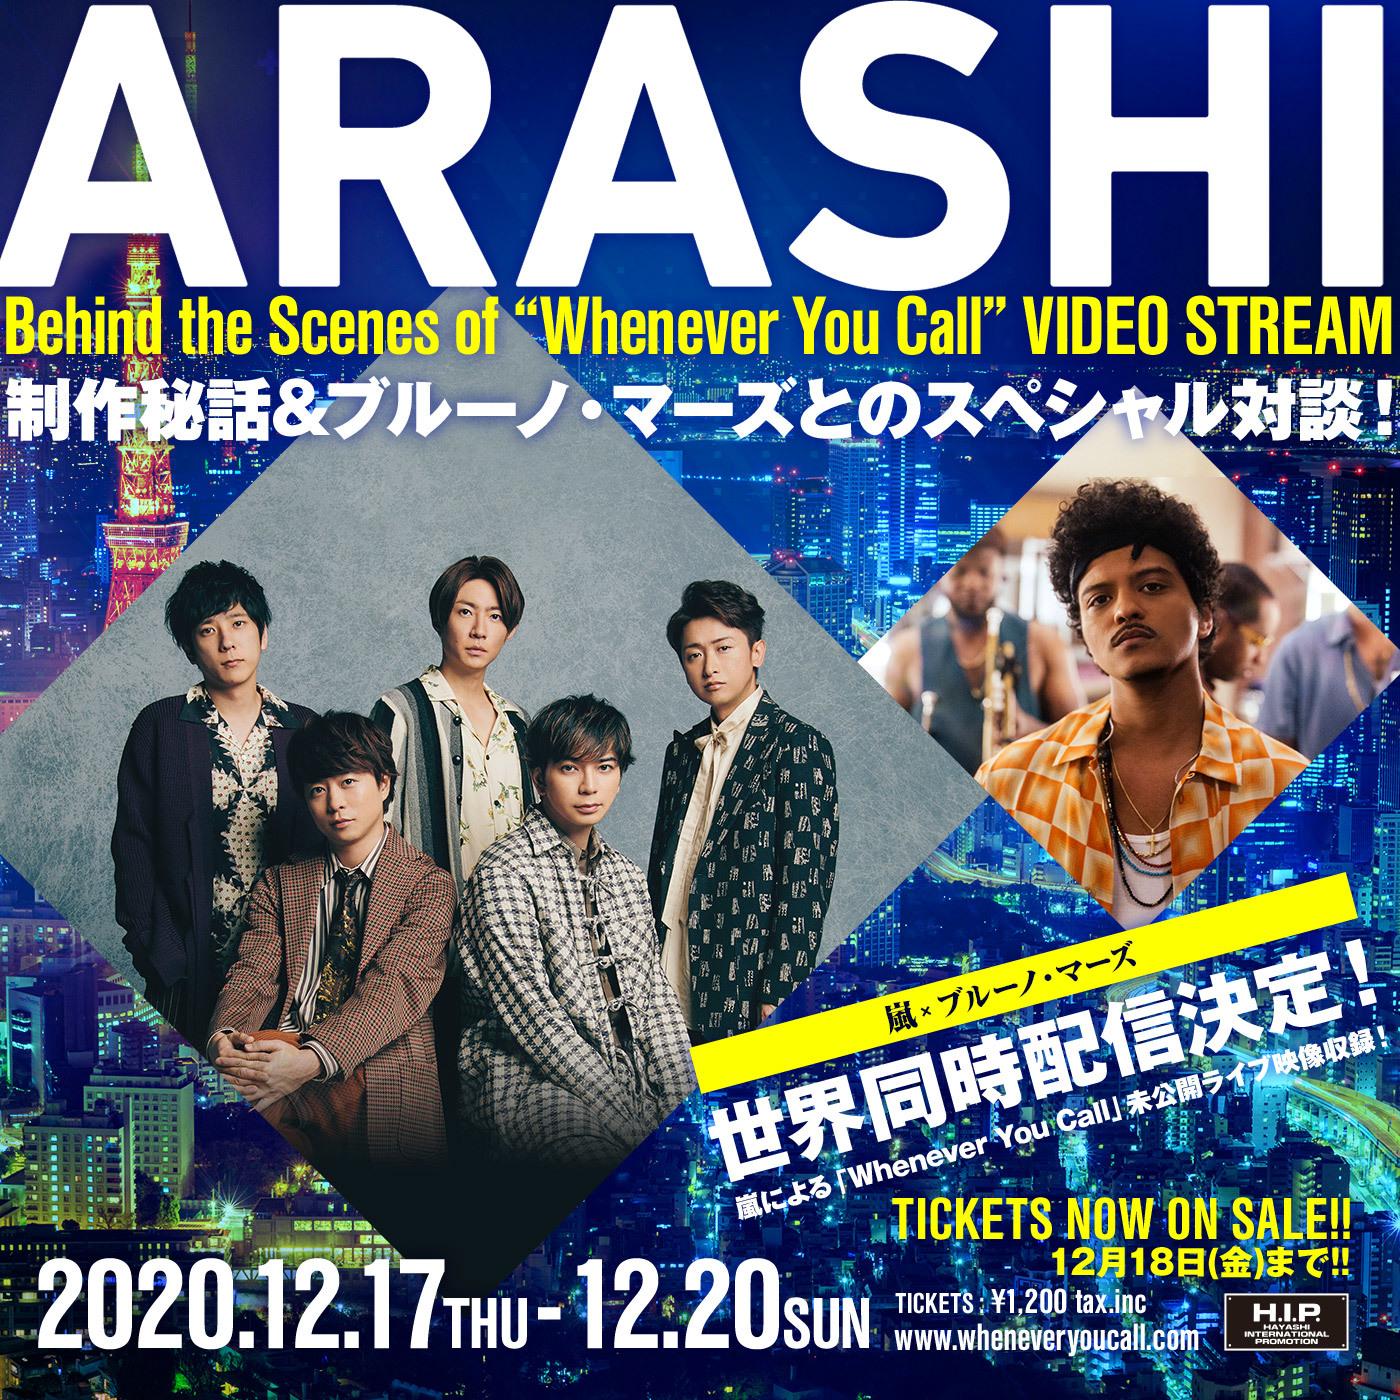 ARASHI × ブルーノ・マーズ